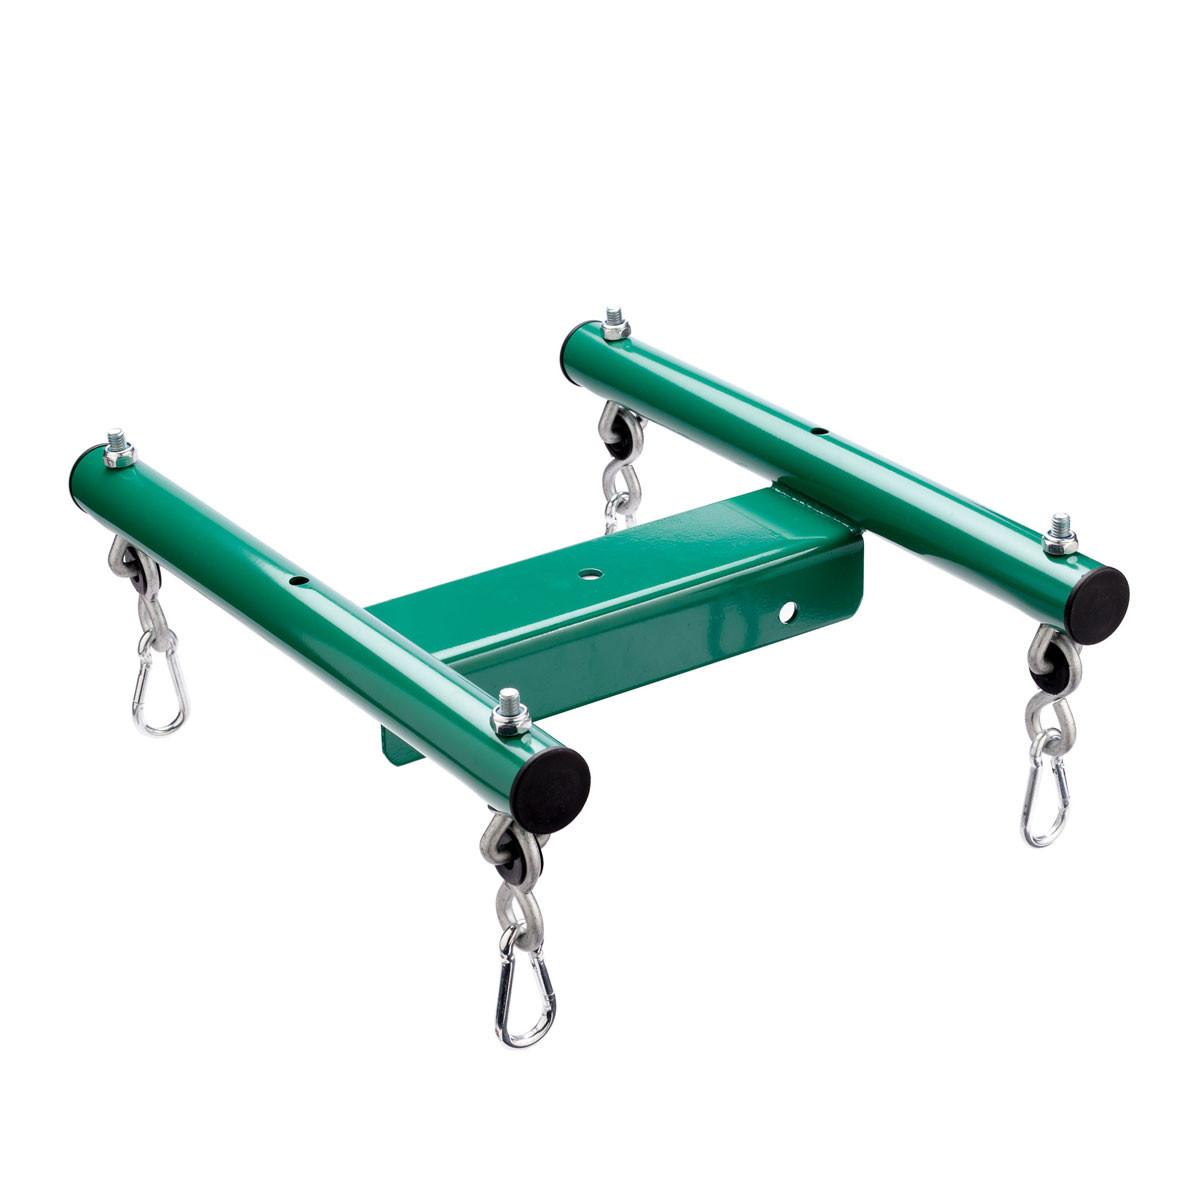 Glider Swing Support Bracket Assembled (optional)